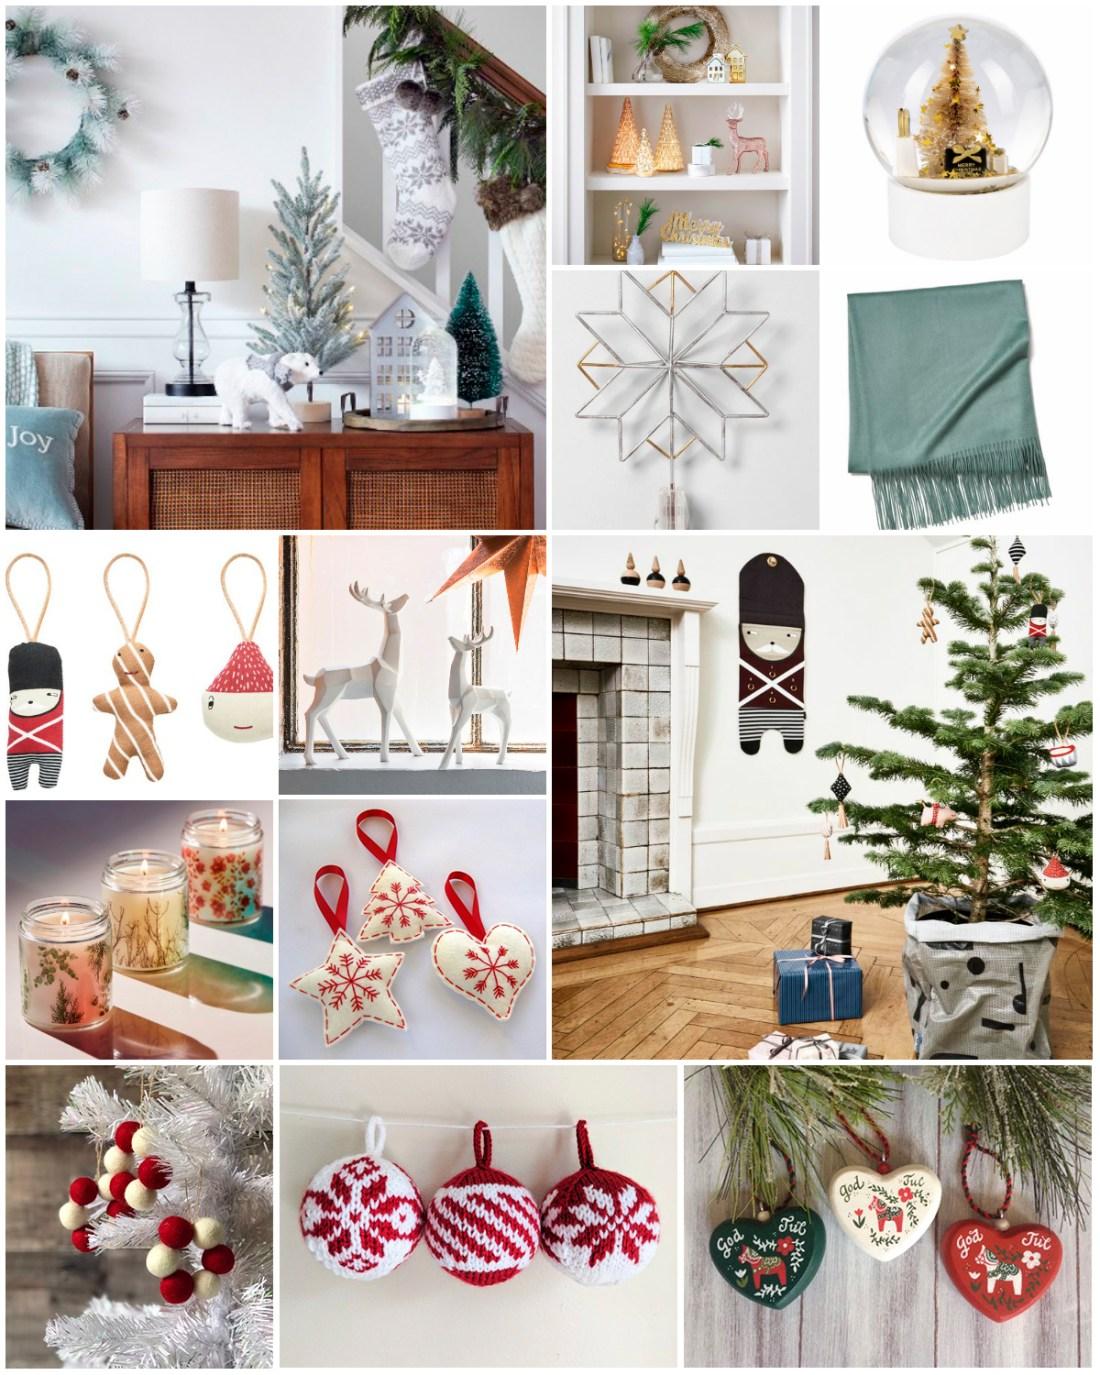 How to achieve a Scandinavian Christmas